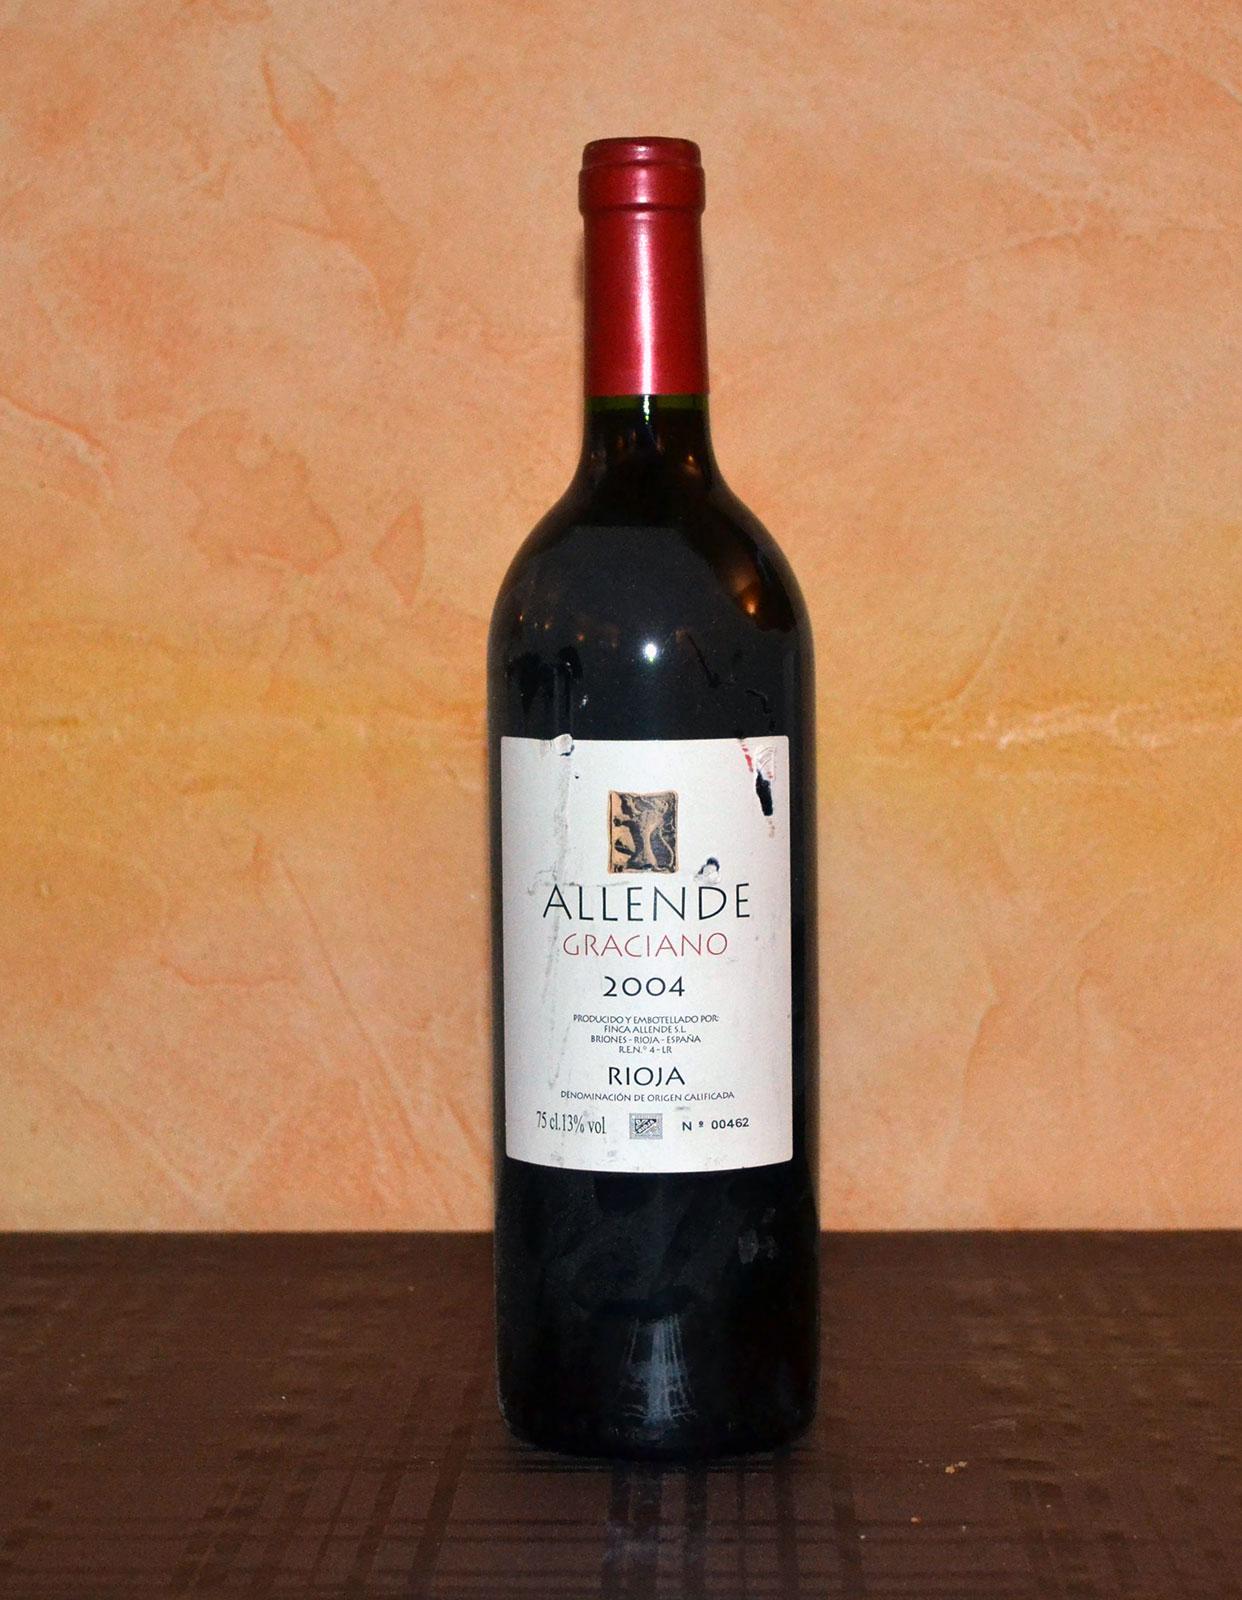 Allende Graciano Reserva 2004